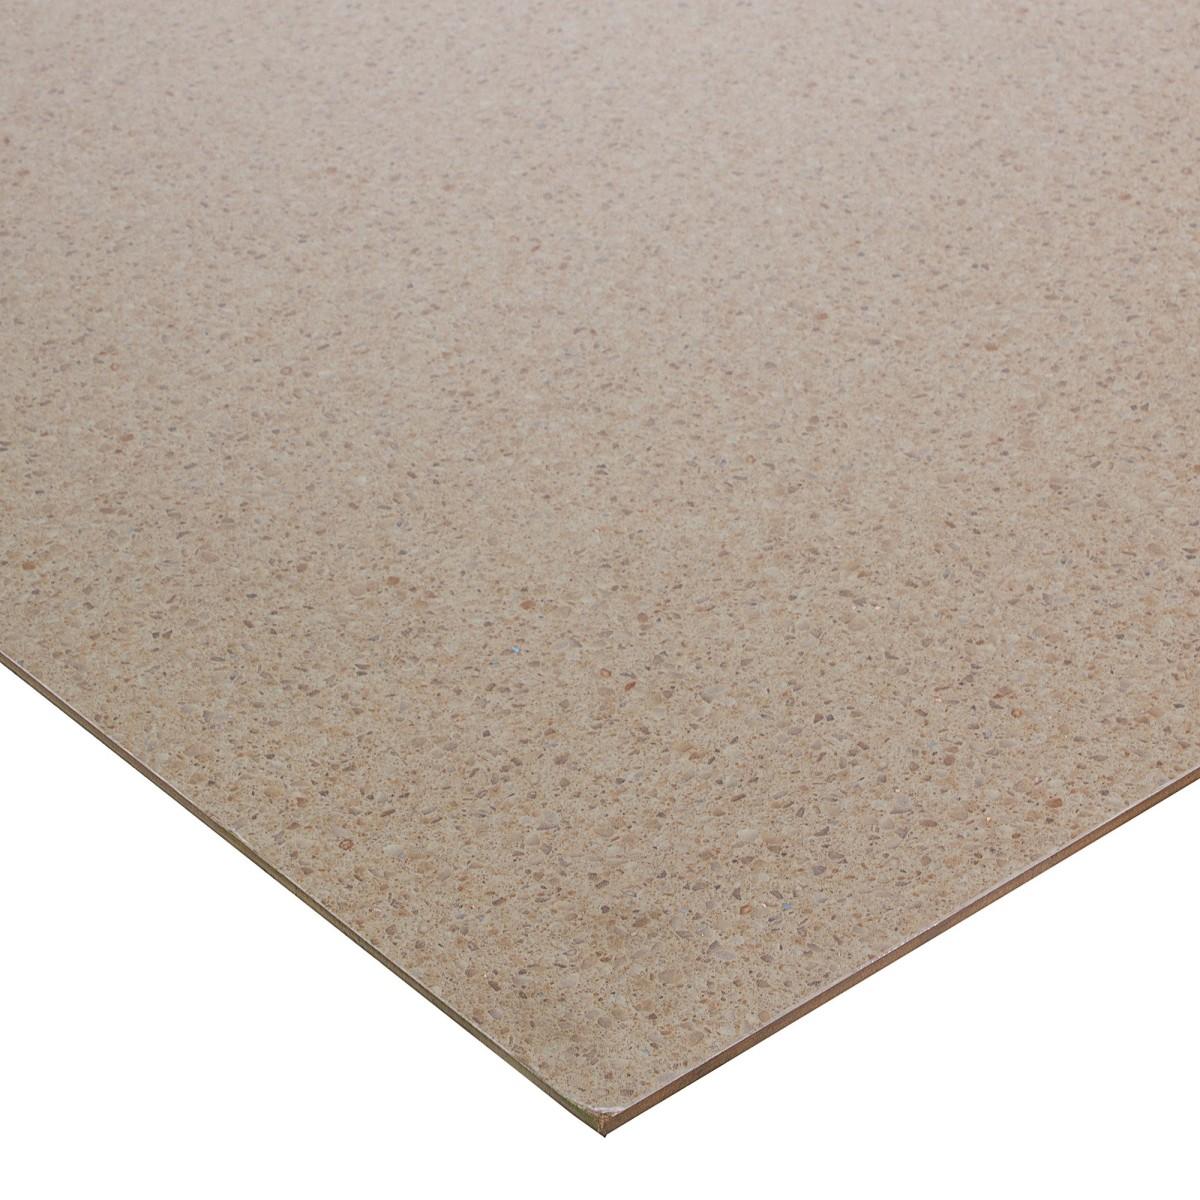 Стеновая панель №422 305х0.4x60 см МДФ цвет камень